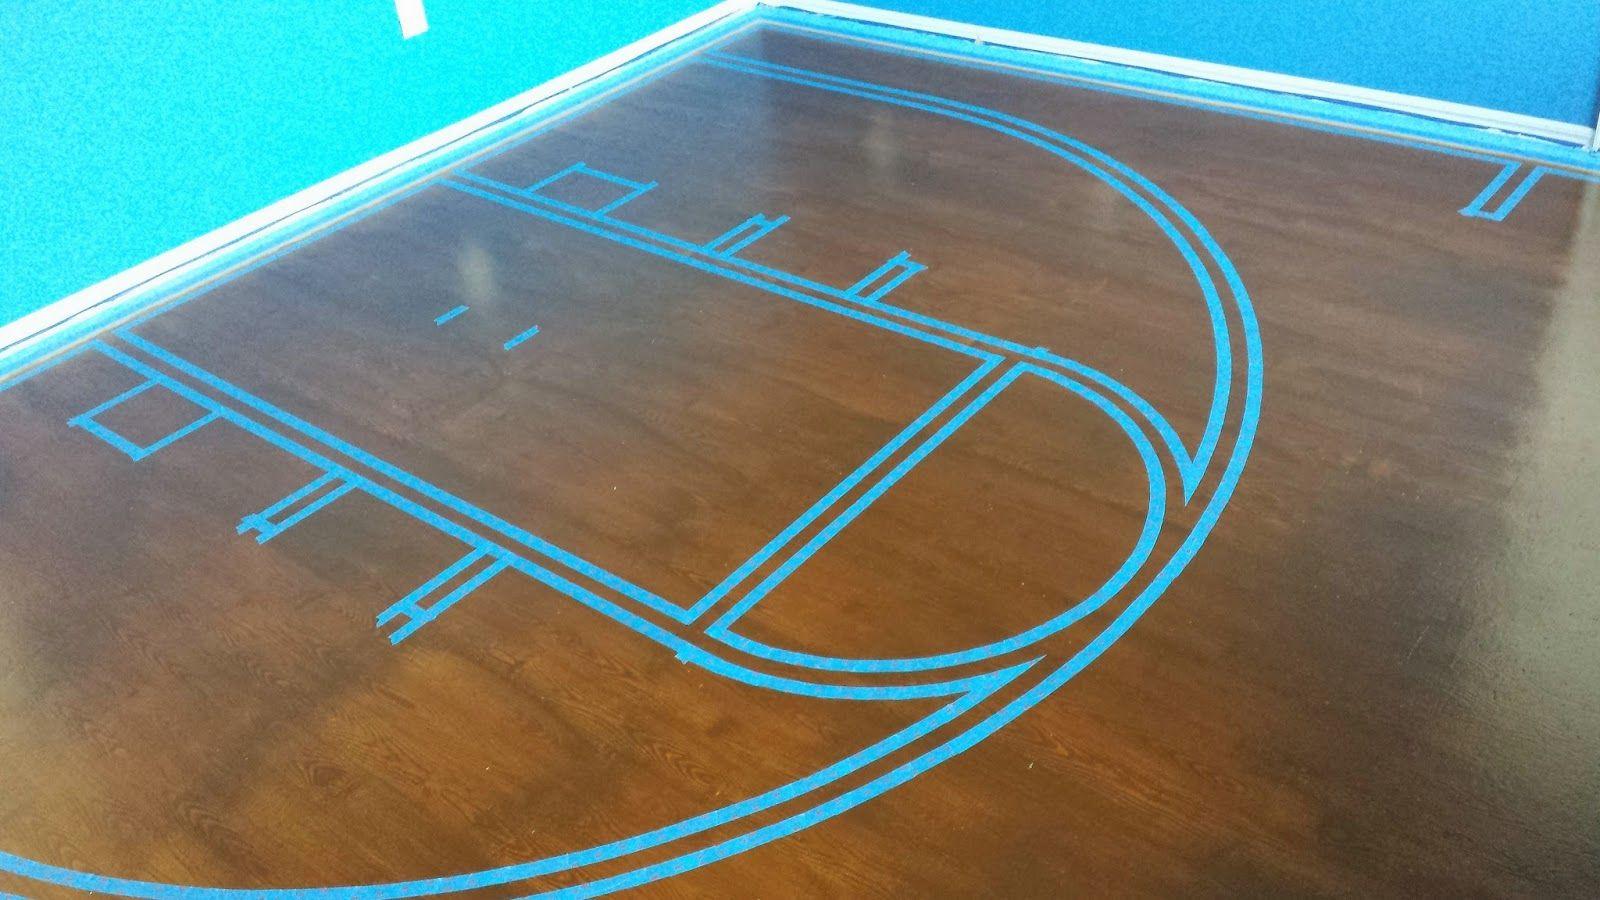 Pin By Pro Dunk Hoops On Pro Dunk Hoops Basketball Goals Backyard Basketball Basketball Court Backyard Backyard